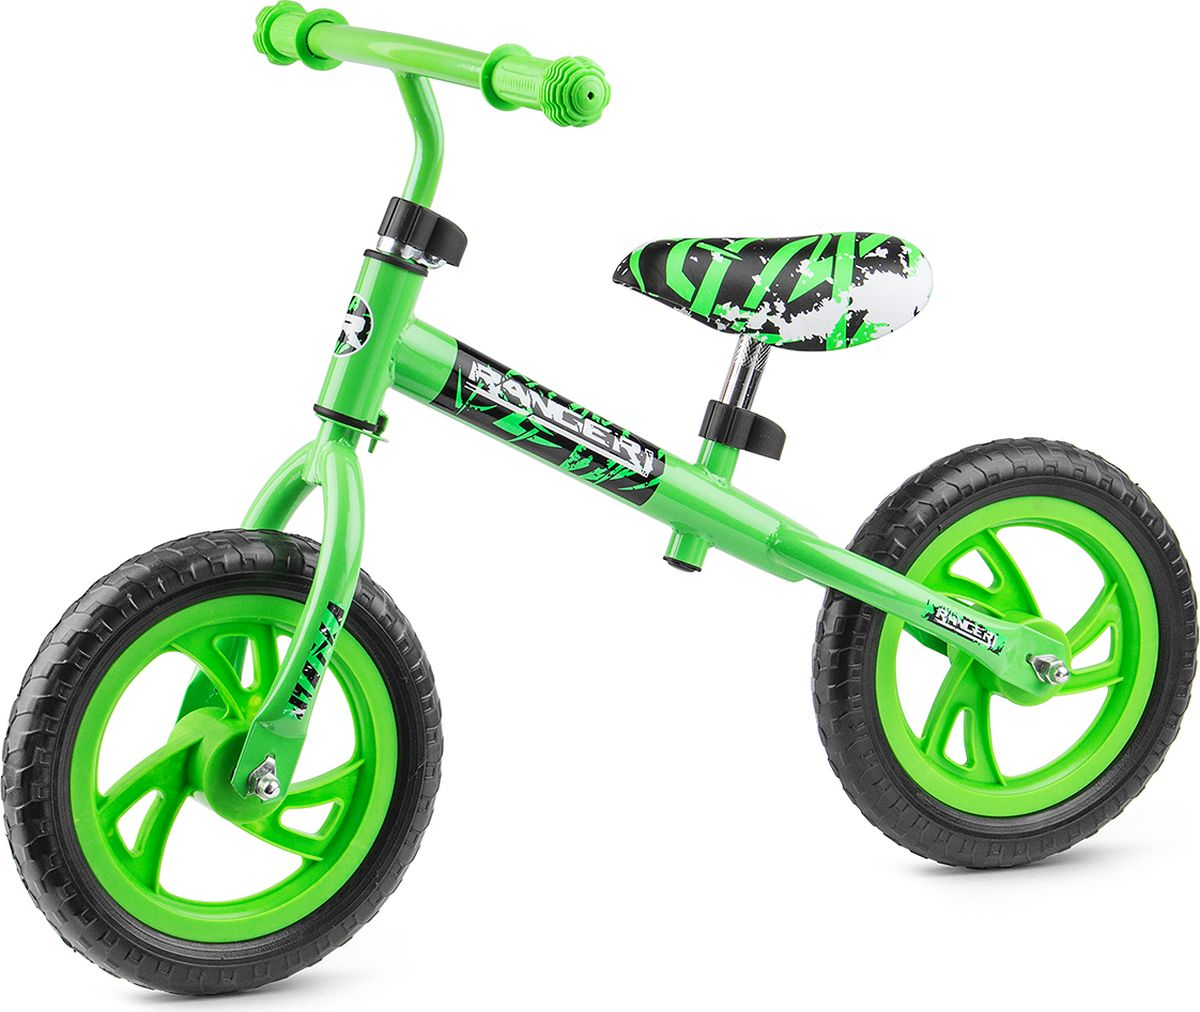 Small Rider Беговел Ranger цвет зеленый - Беговелы